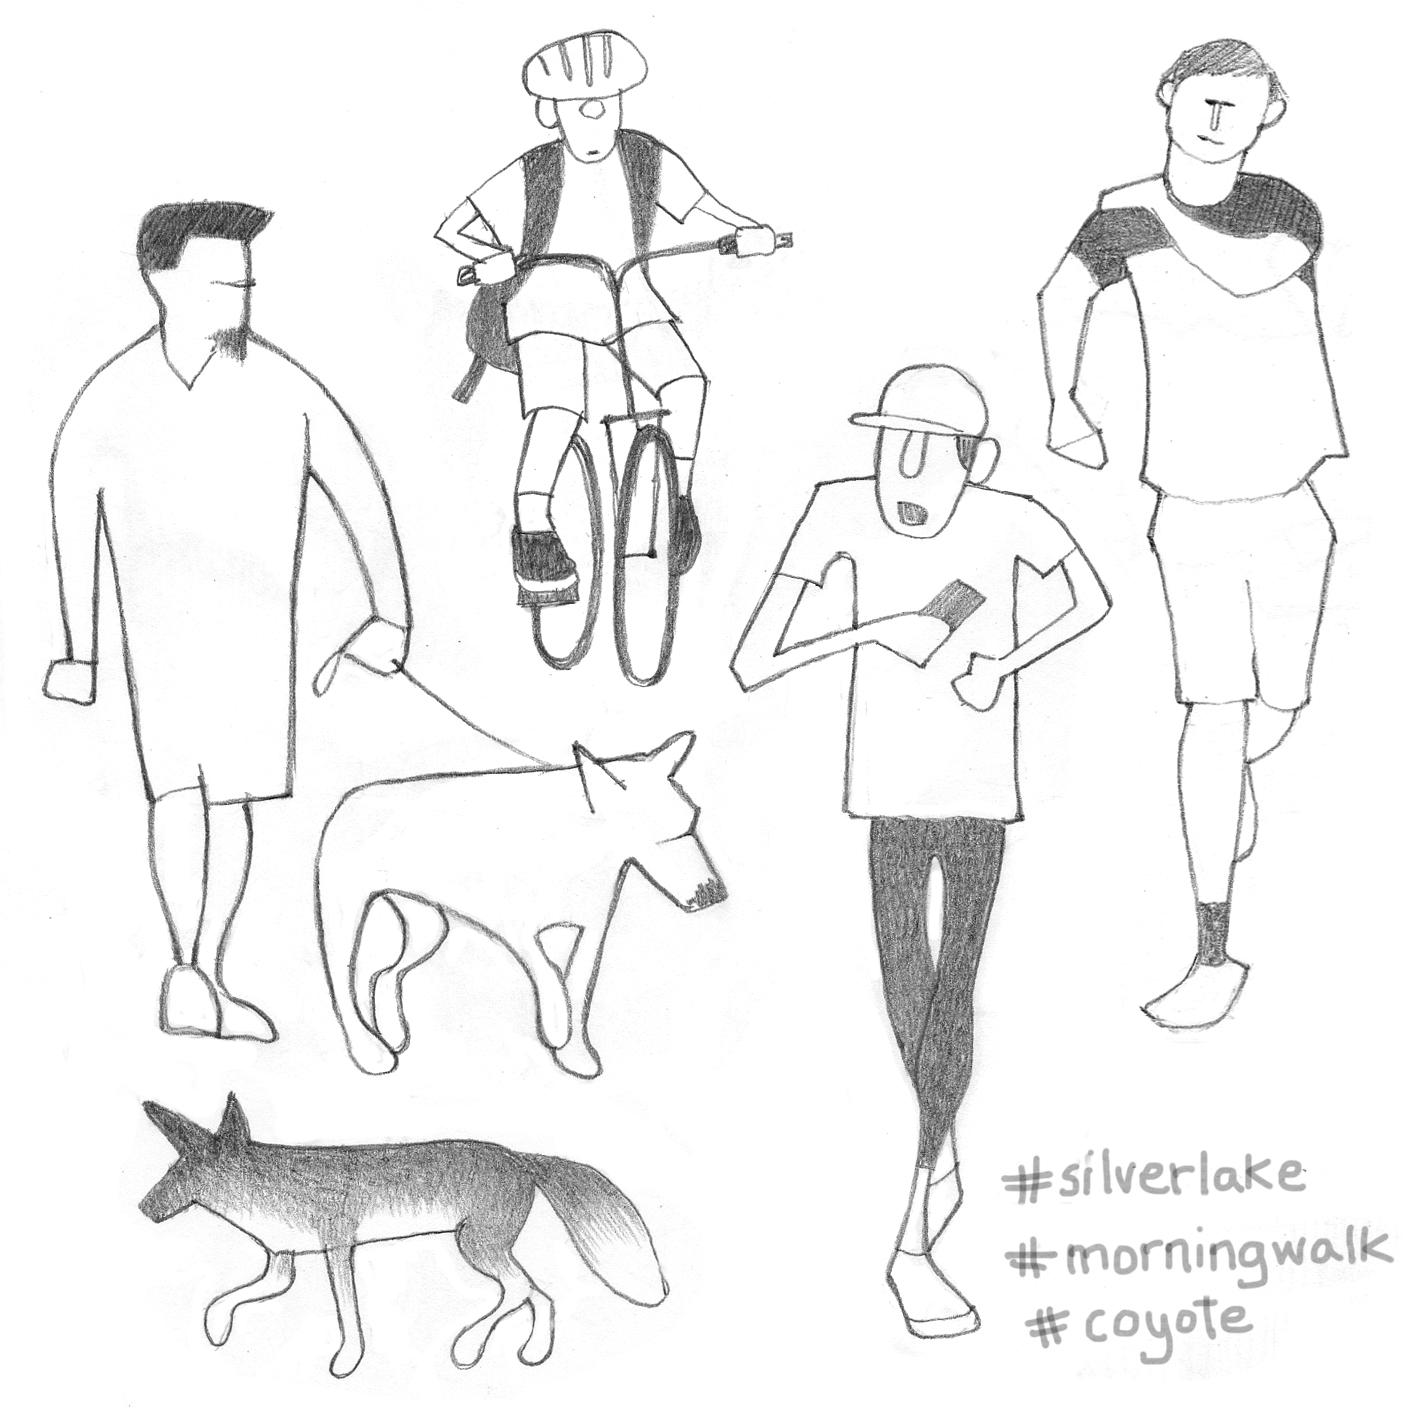 Silver Lake walkers